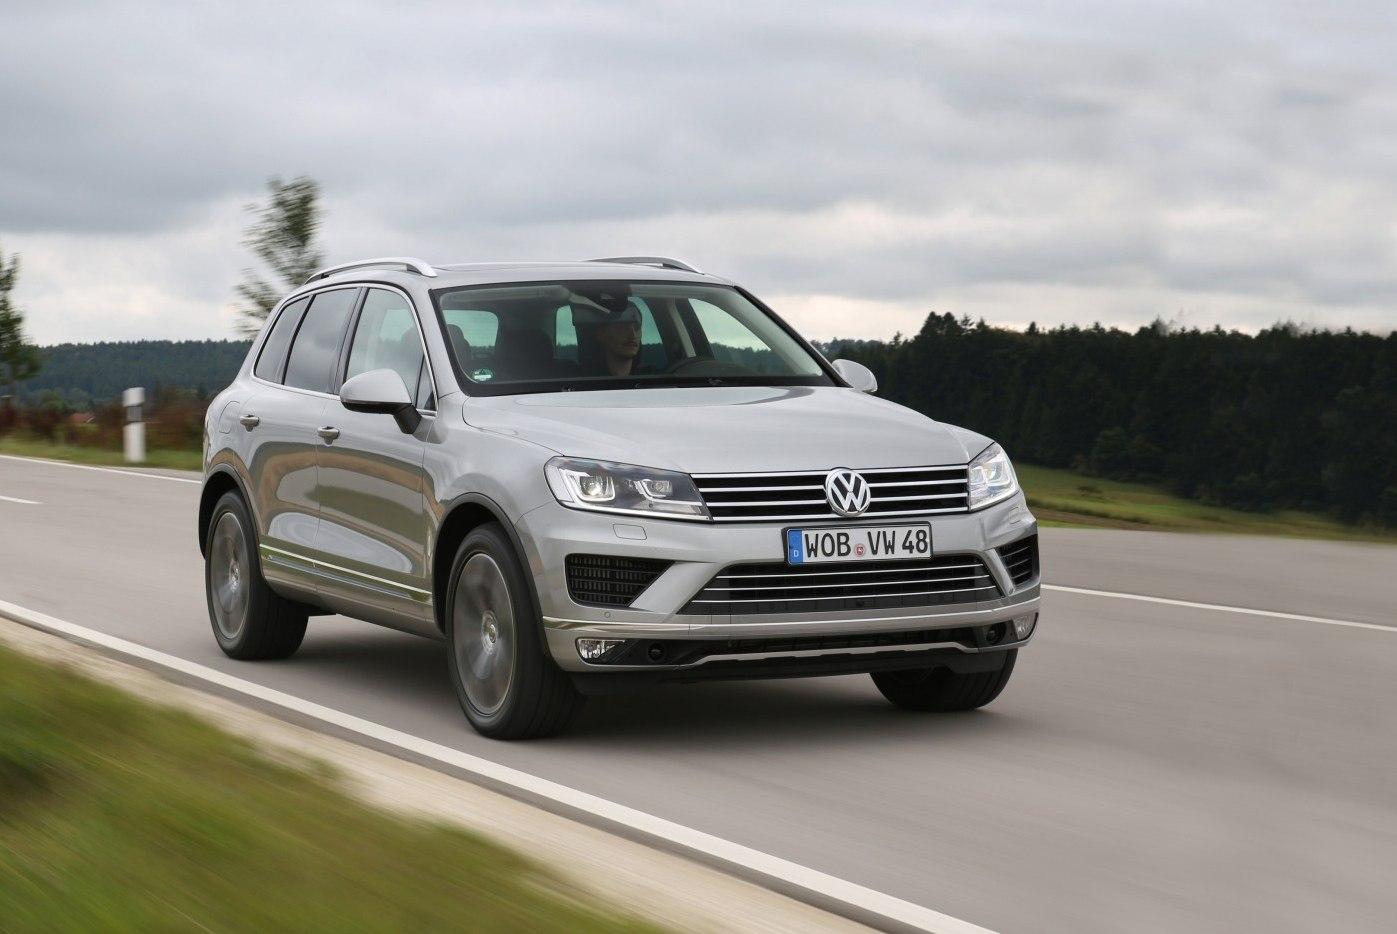 Volkswagen Touareg стал теперь ВИП-авто, судя по размеру налога